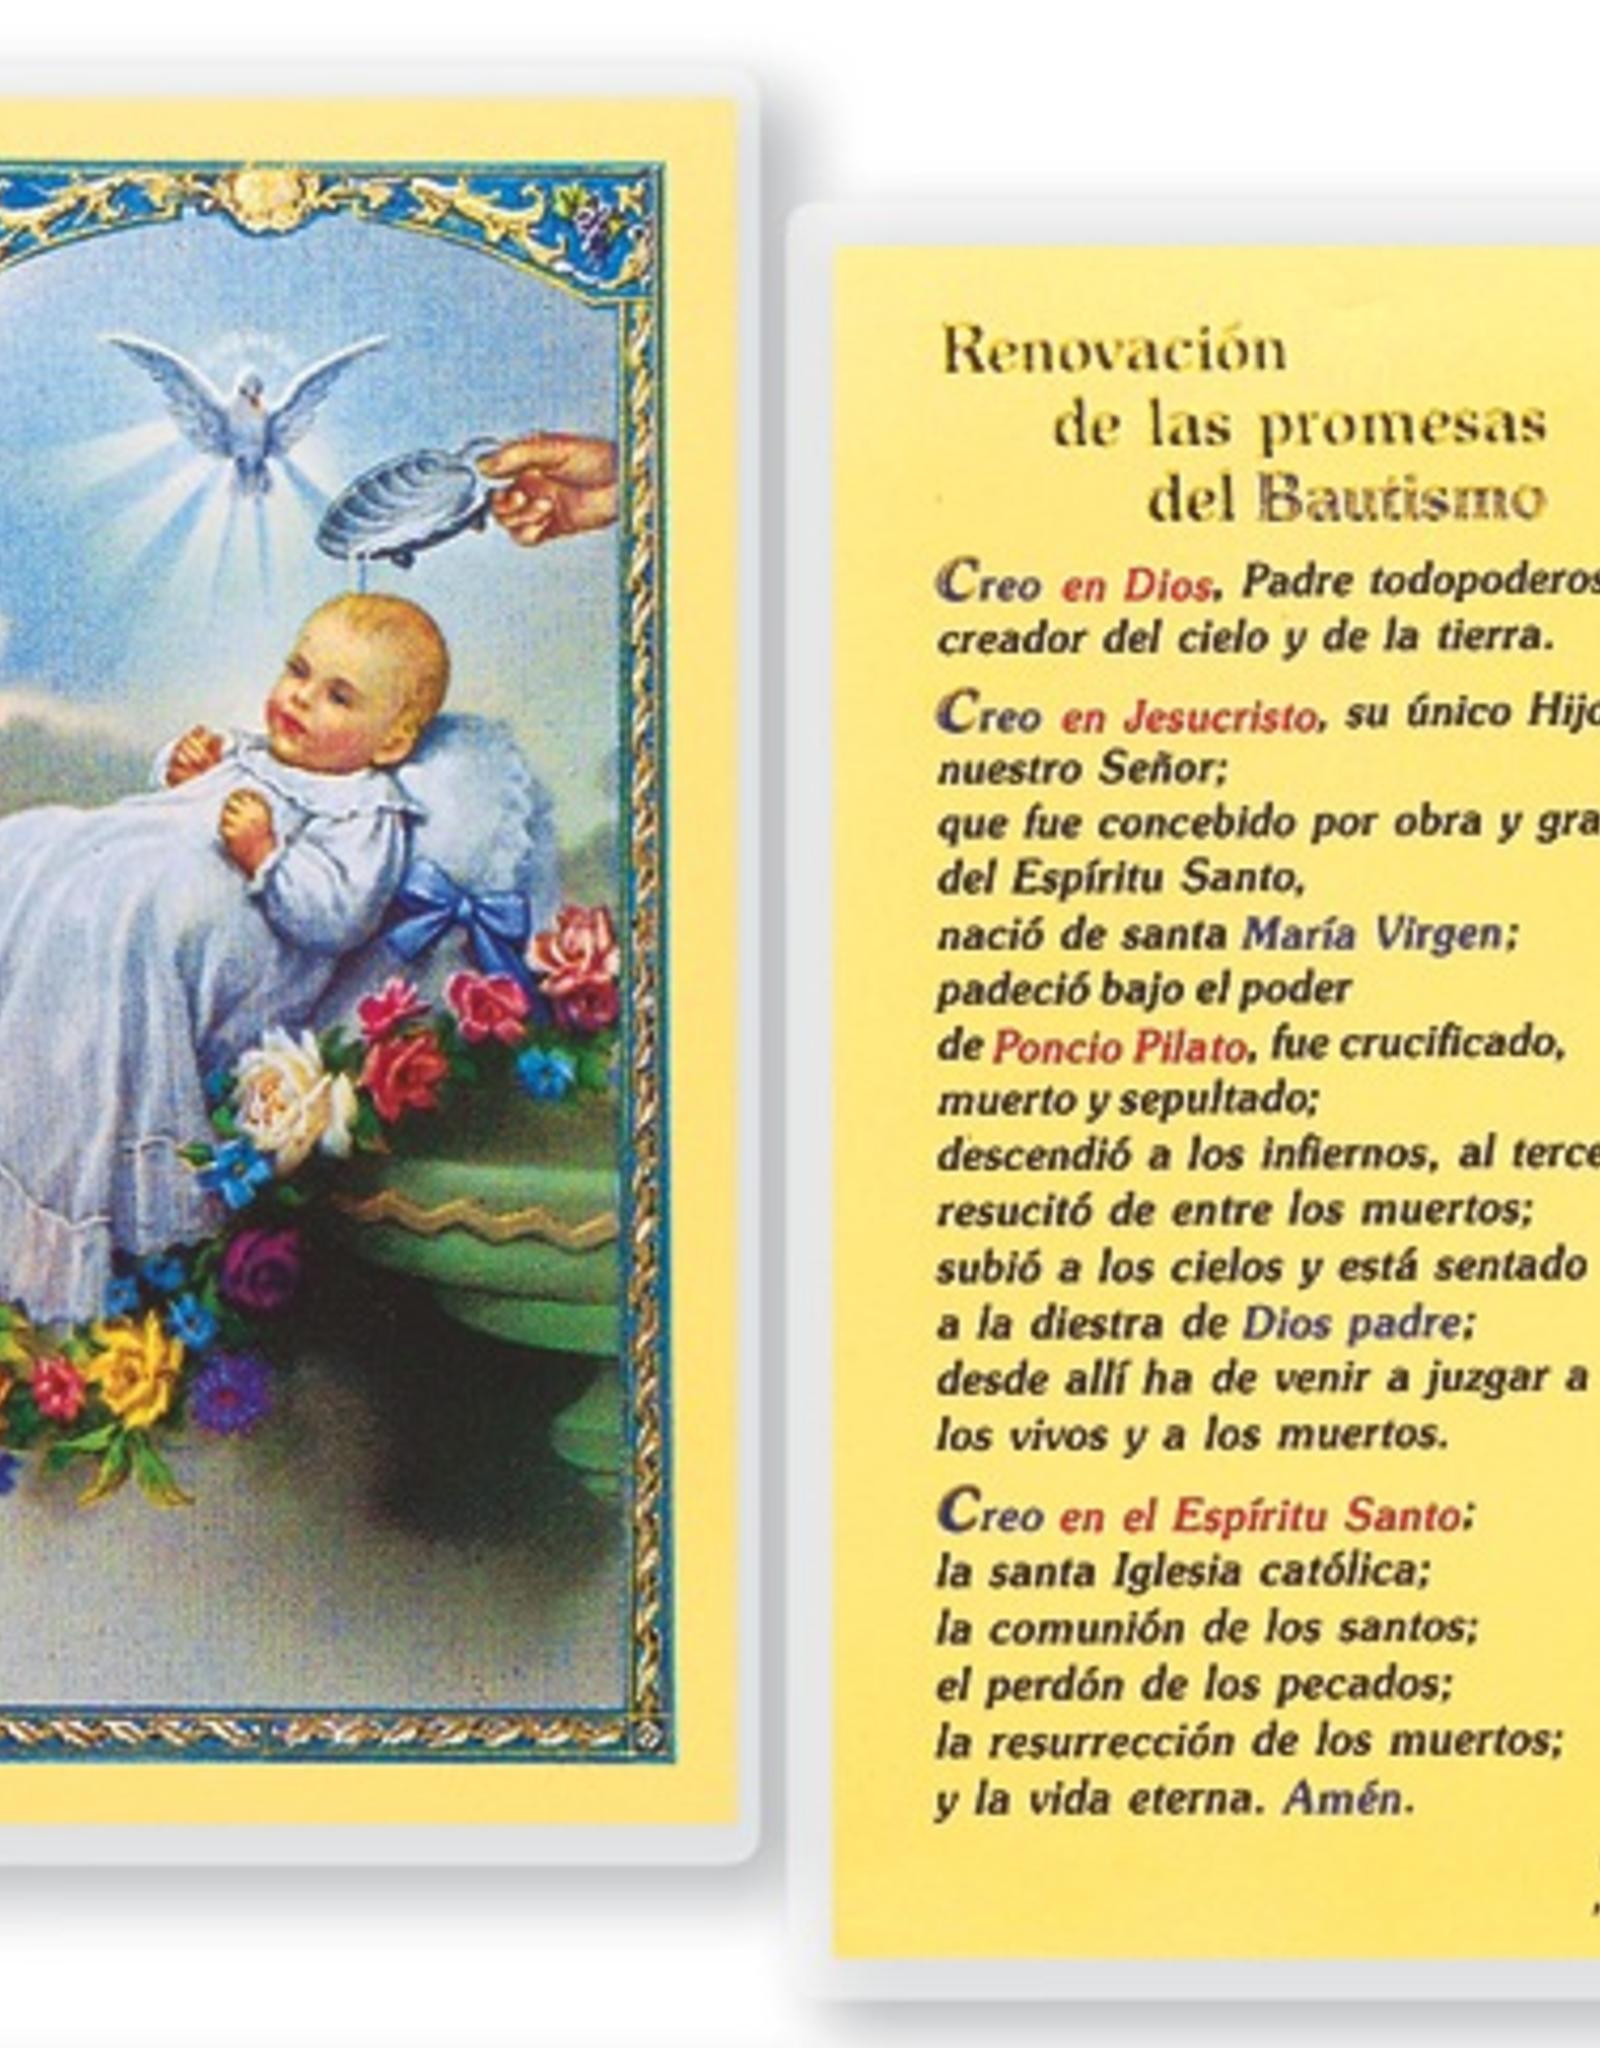 WJ Hirten Bautismo - Renovacion de las promesas del Bautismo